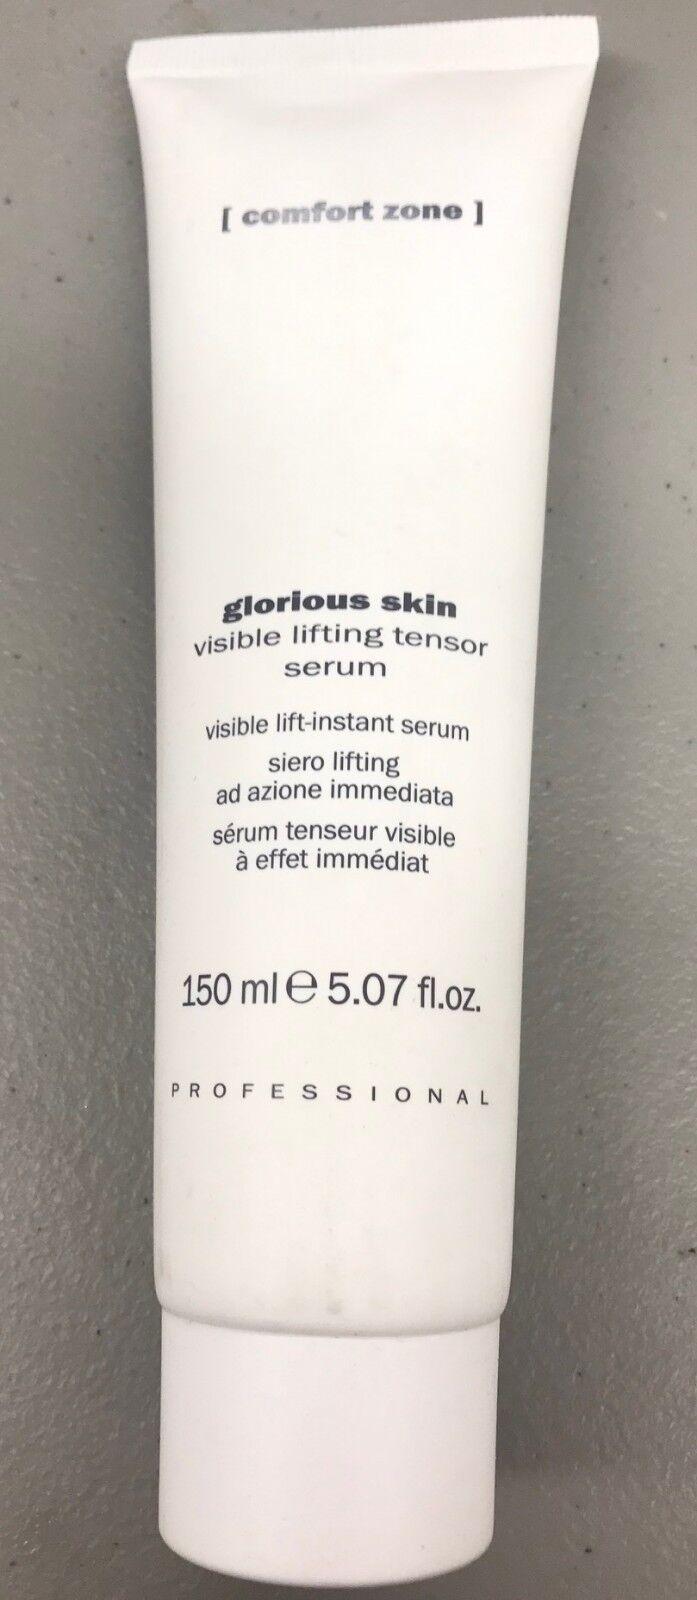 Salon Pro À Pro comfort zone visible lifting tensor serum 150ml salon pro size